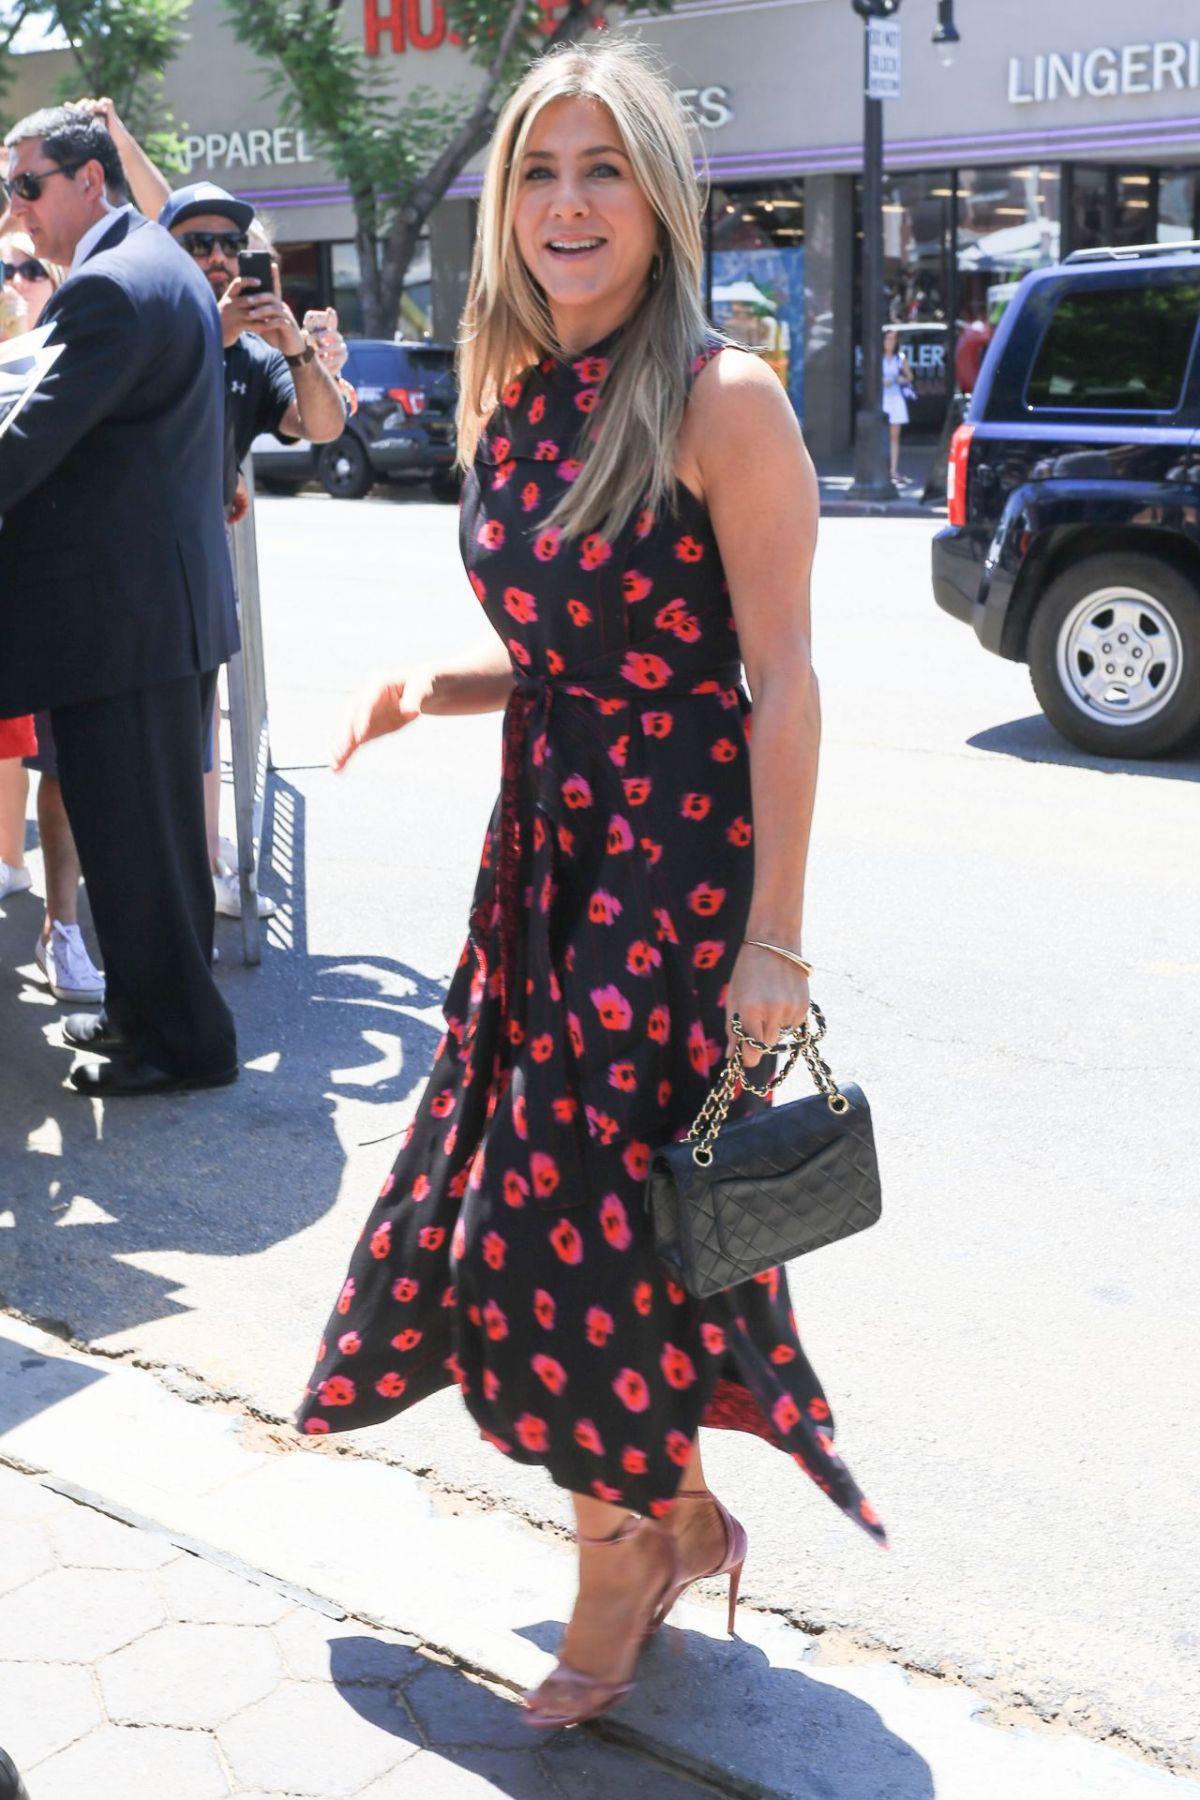 JENNIFER ANISTON at Jason Bateman's Hollywood Star Ceremony in Hollywood 07/26/2017